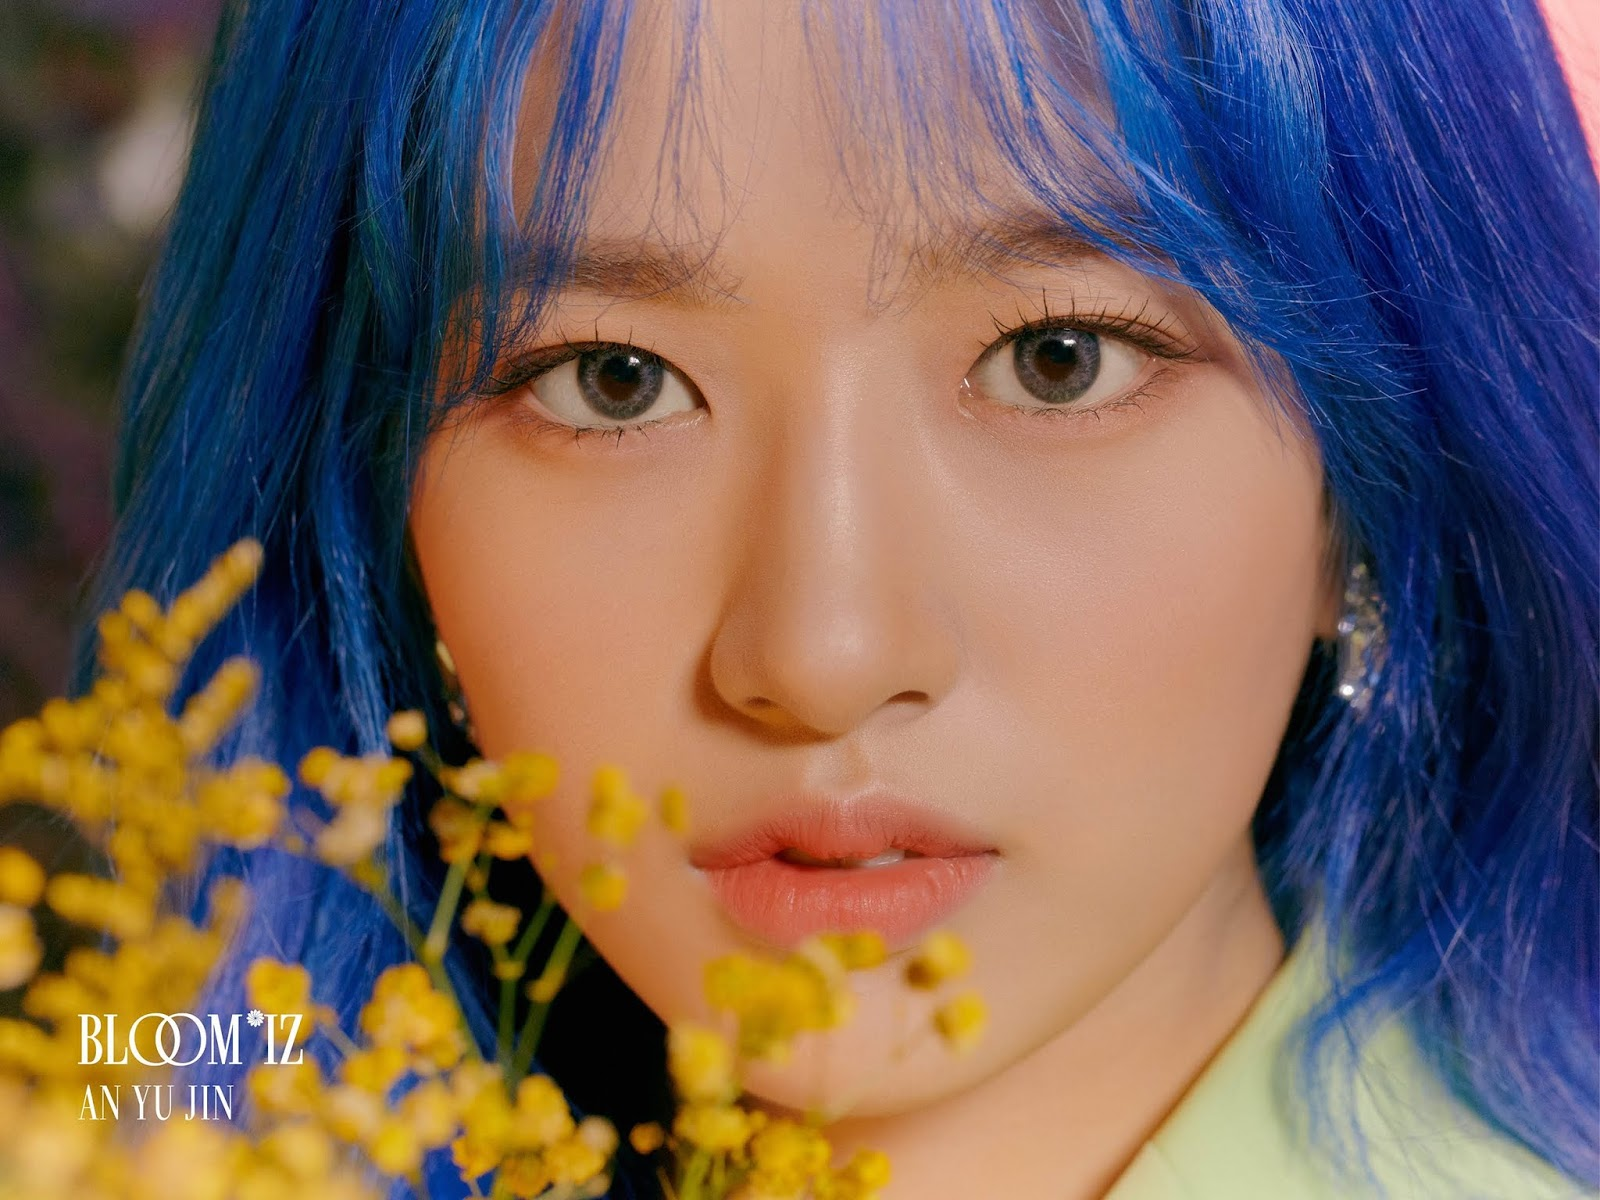 Yujin, Wonyoung and Nako IZ*ONE Looks Beautiful in the Latest Teaser 'BLOOM*IZ'